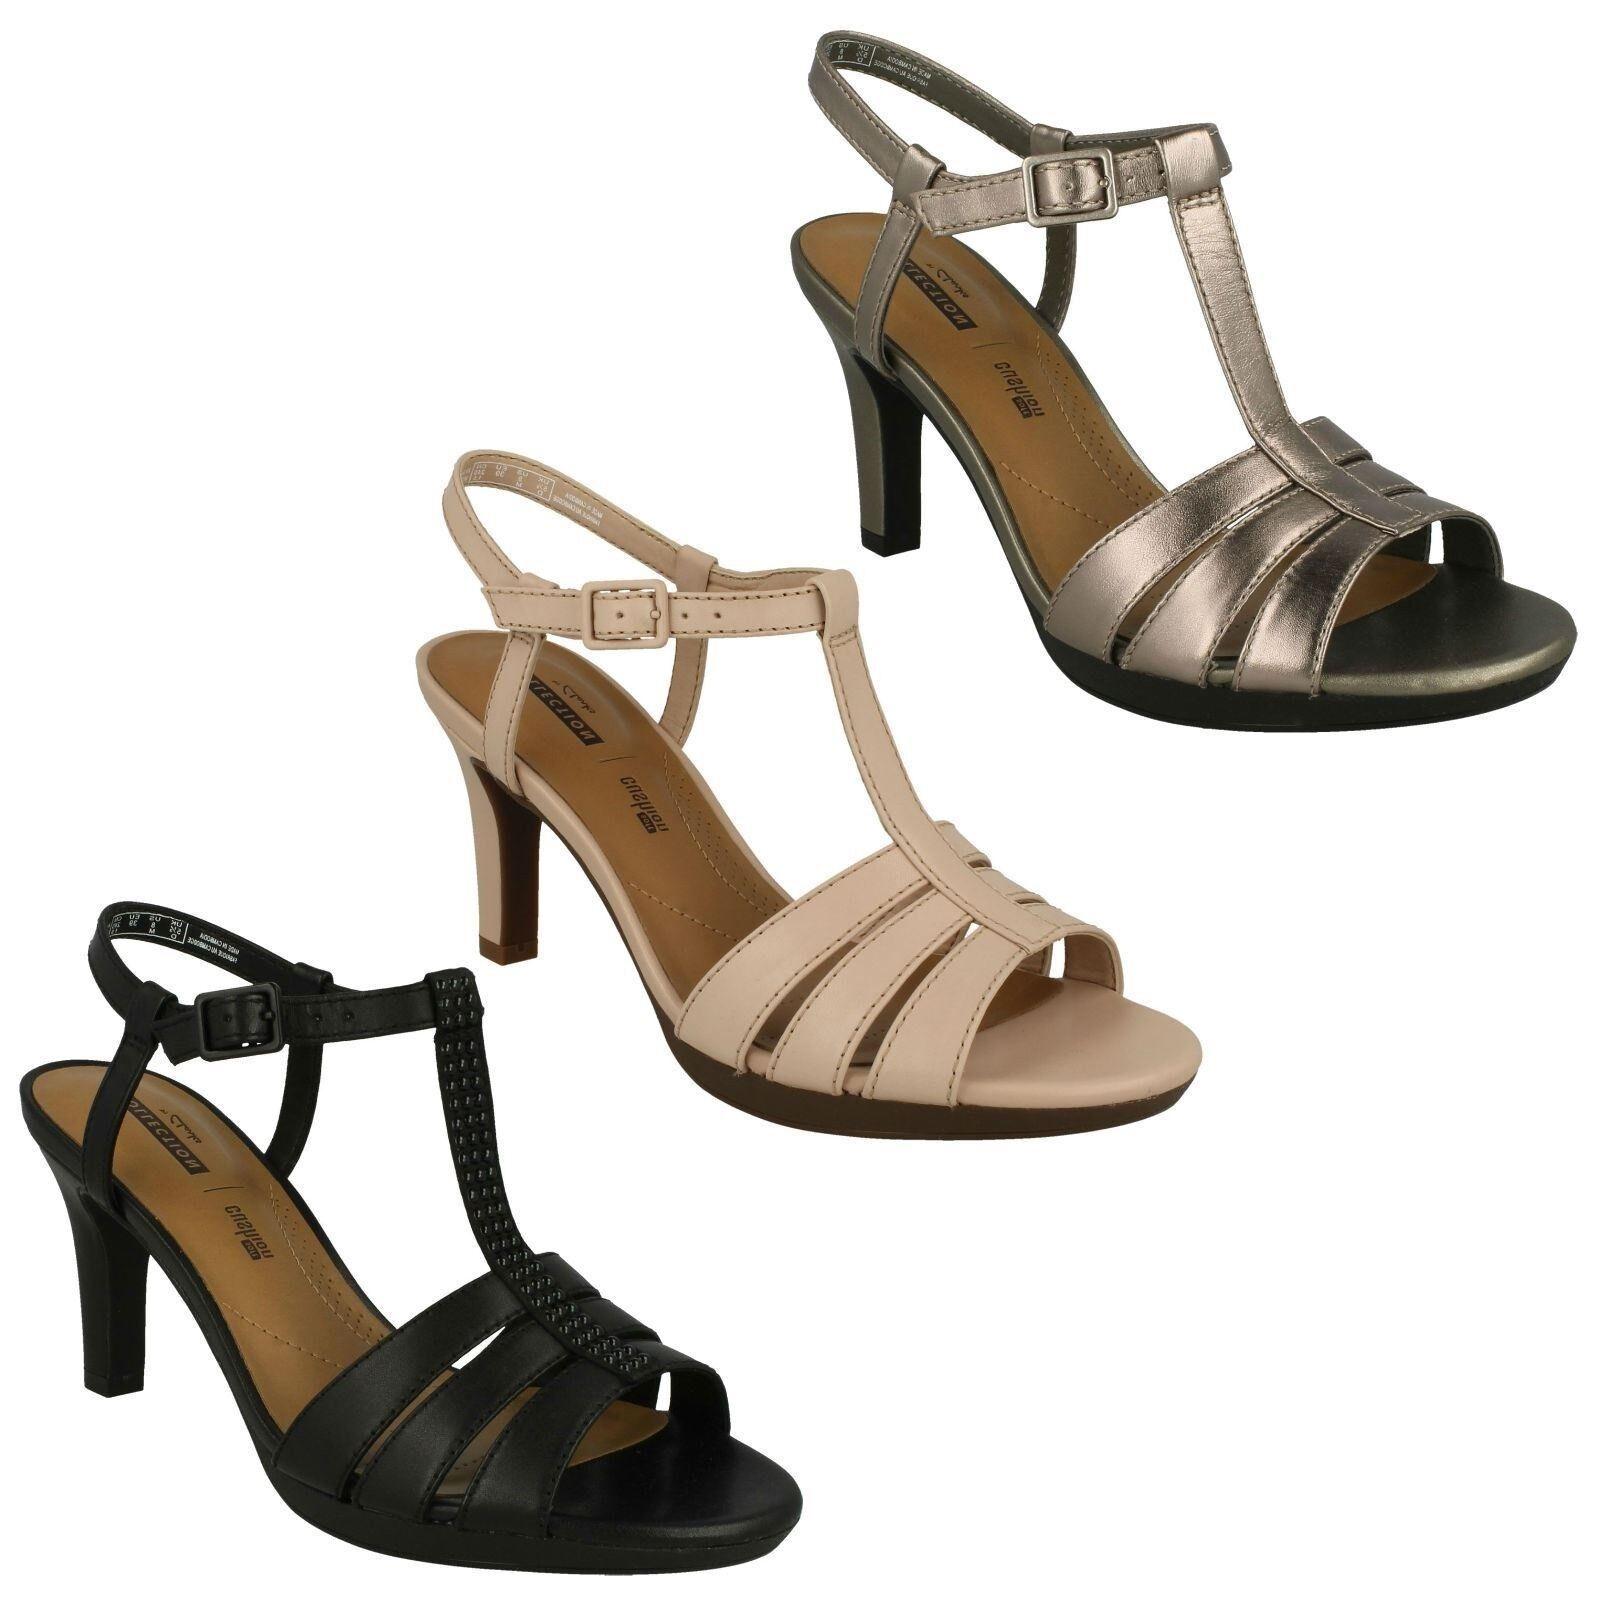 Damen Schnalle Clarks Leder Riemen Absatz Schnalle Damen Smart Sandalen Schuhe Adriel Tevis f0065e